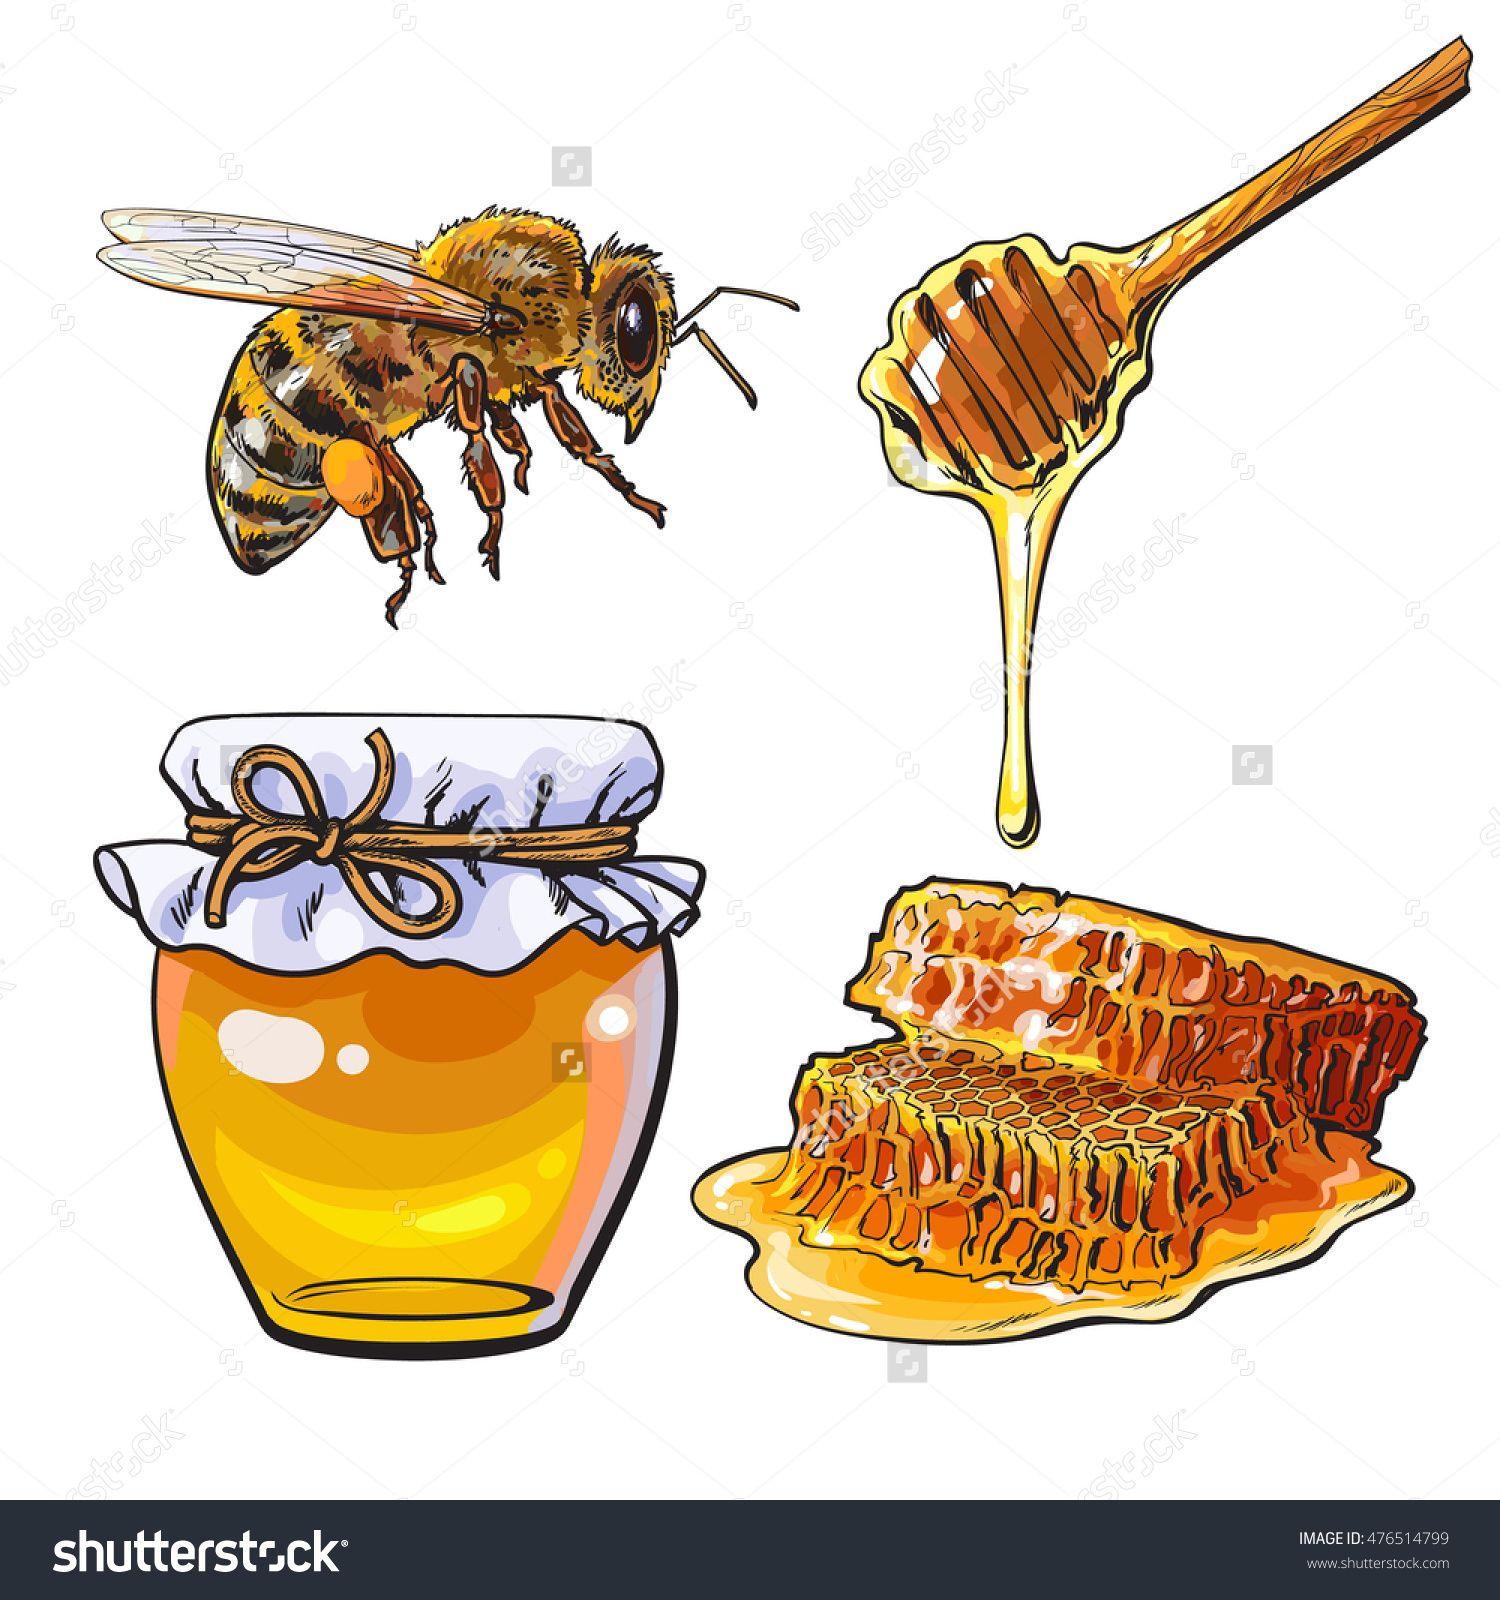 Honey clipart sketch. Jar of bee dipper